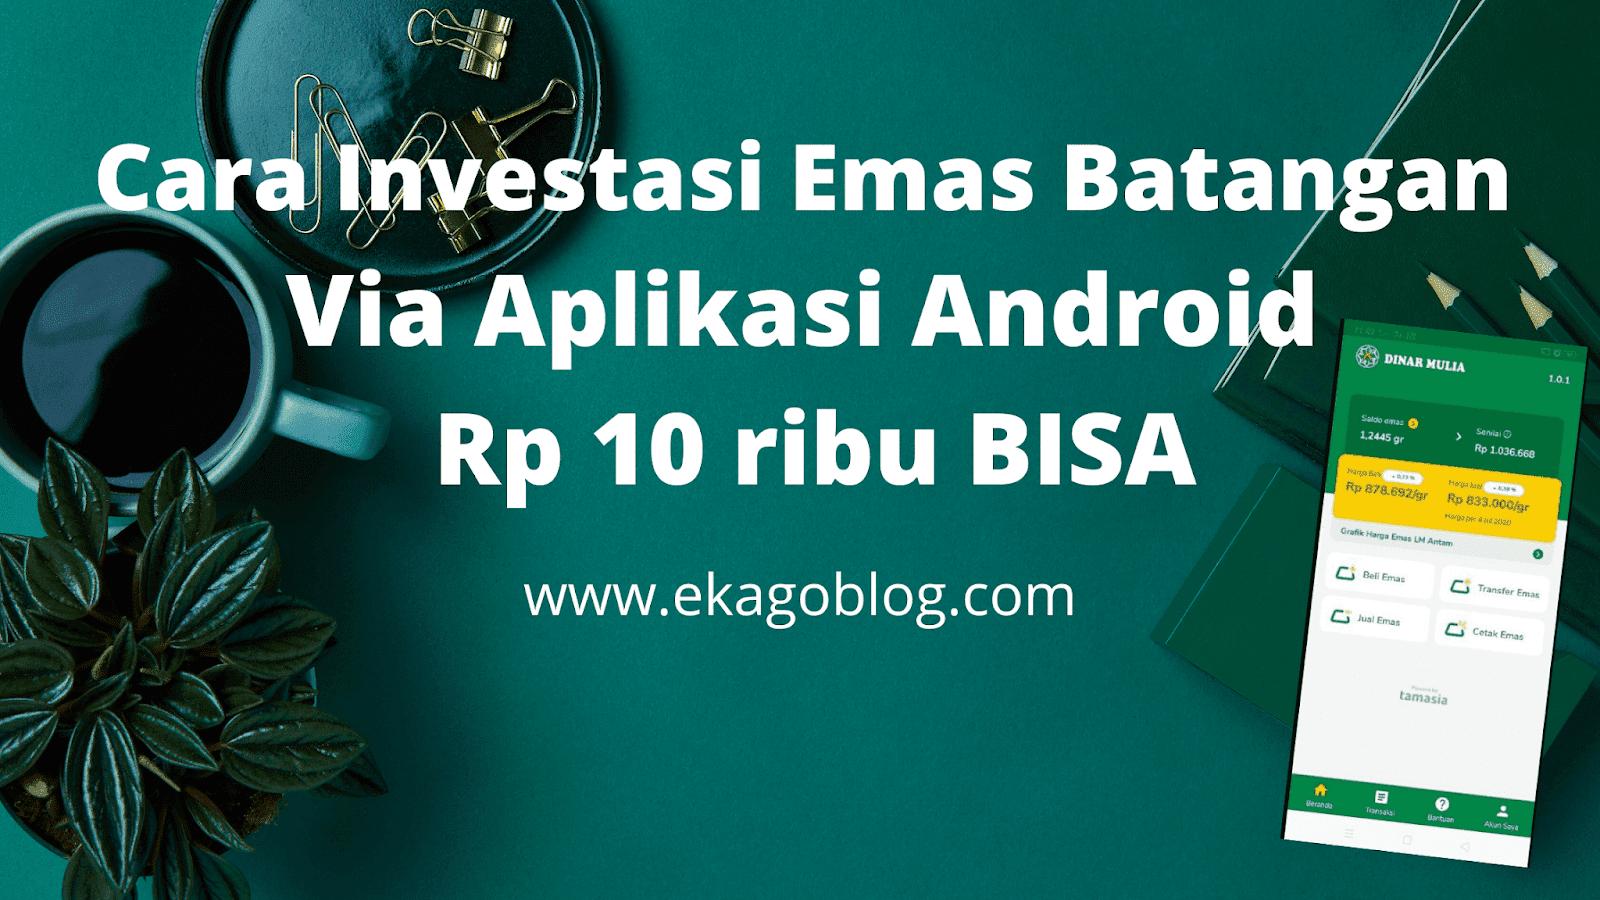 Cara Investasi Emas Batangan Via Aplikasi Android Rp 10 ribu BISA